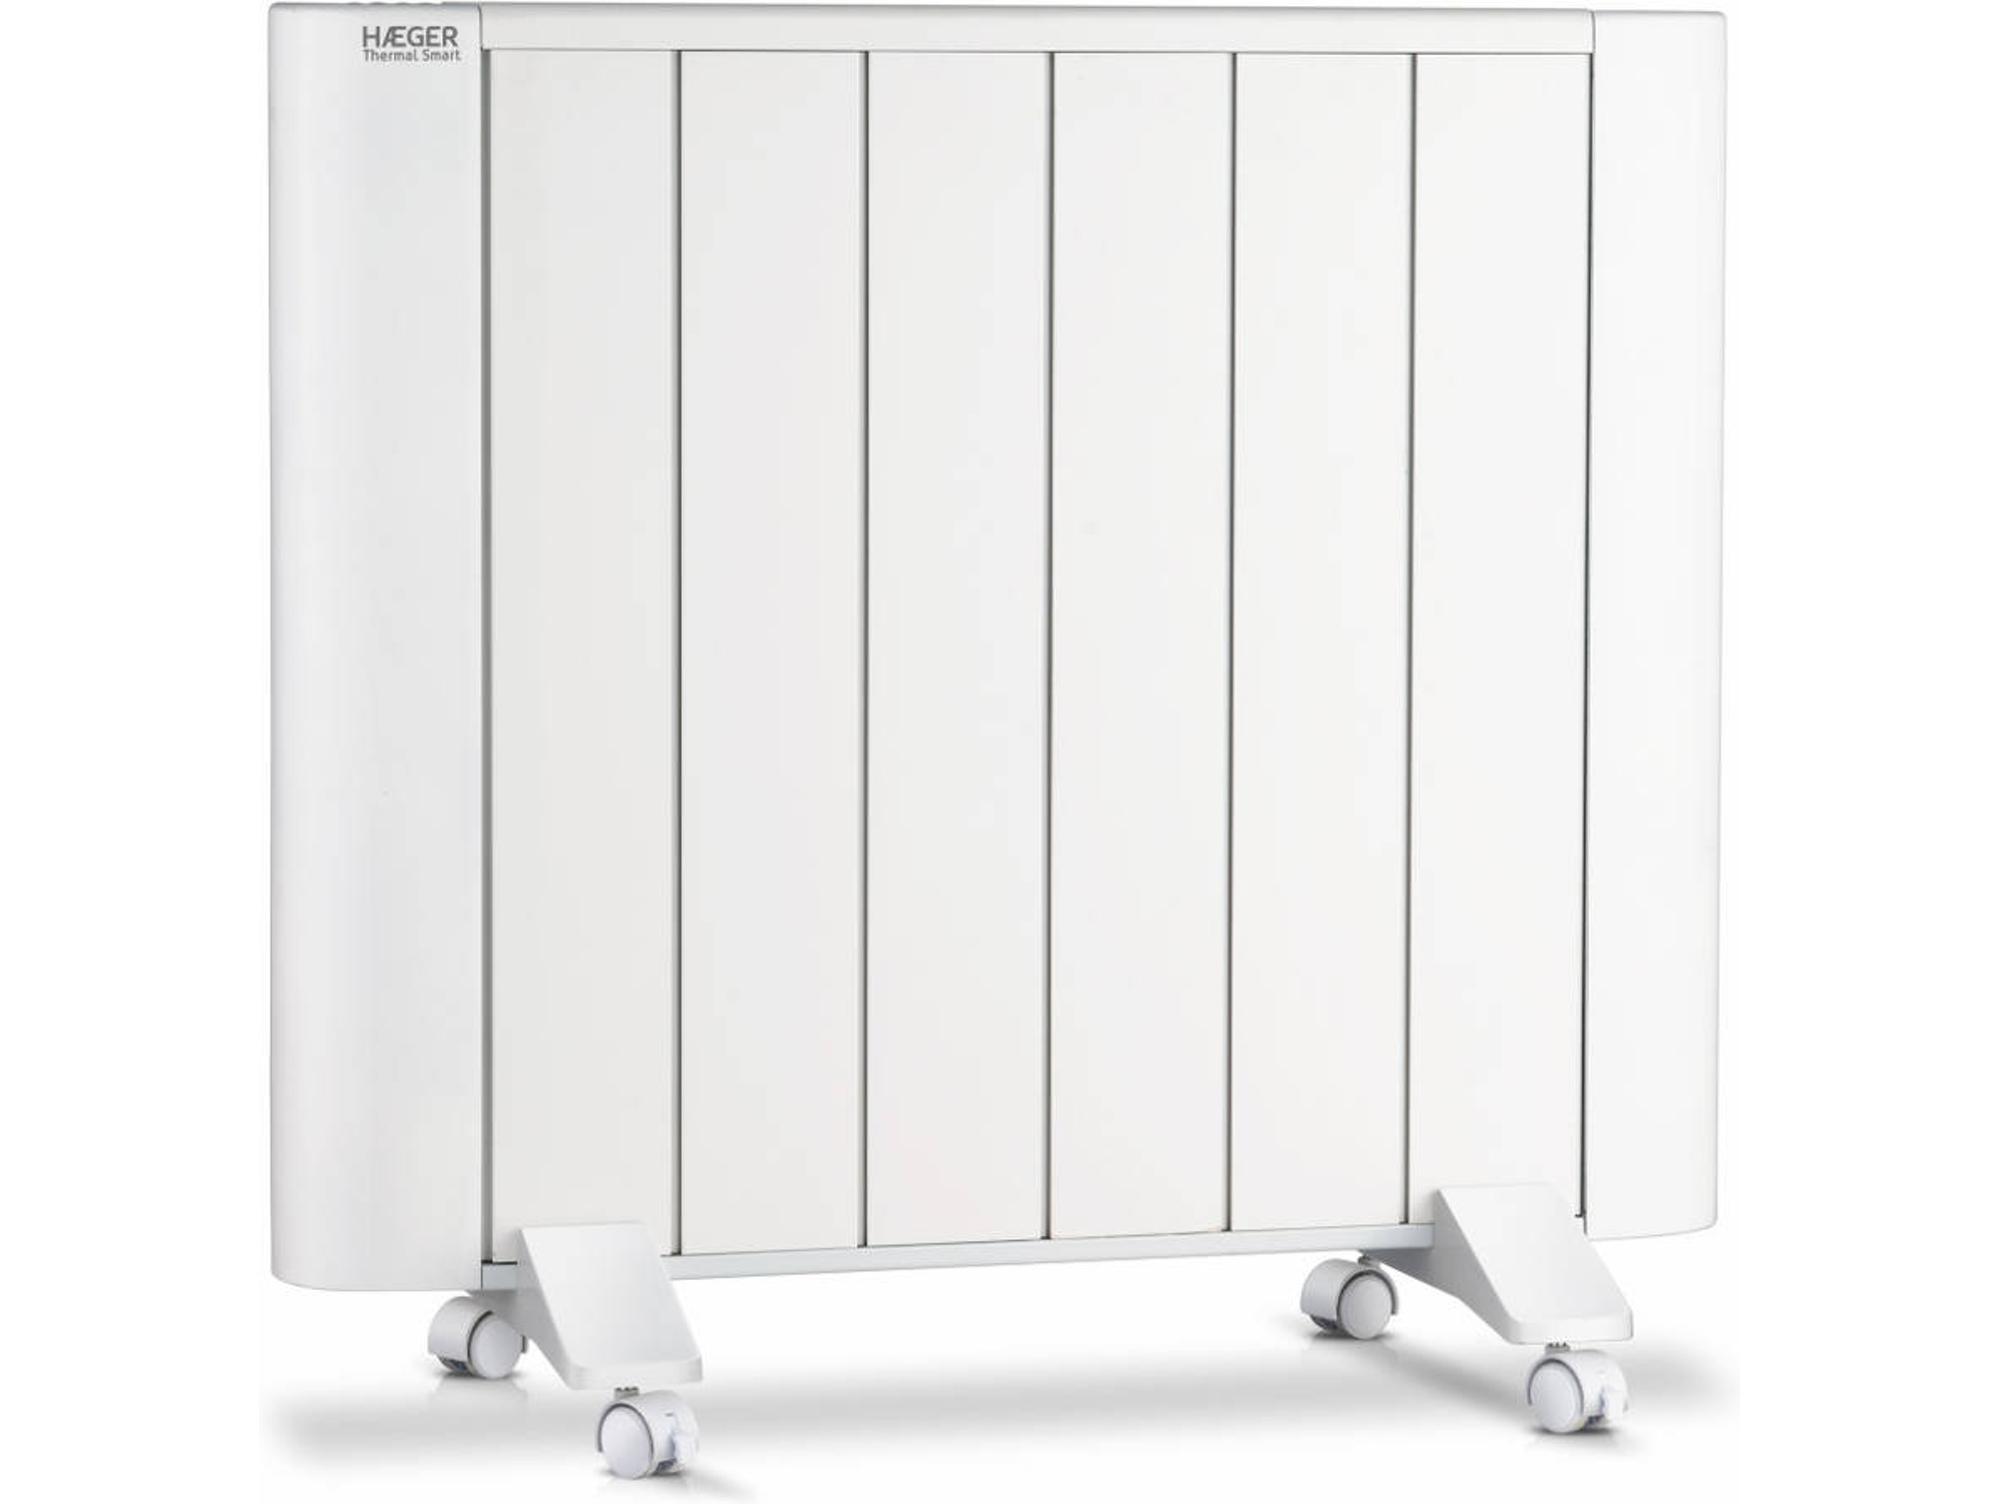 Emisor Térmico HAEGER Thermal Smart (1000 W) | Worten.es